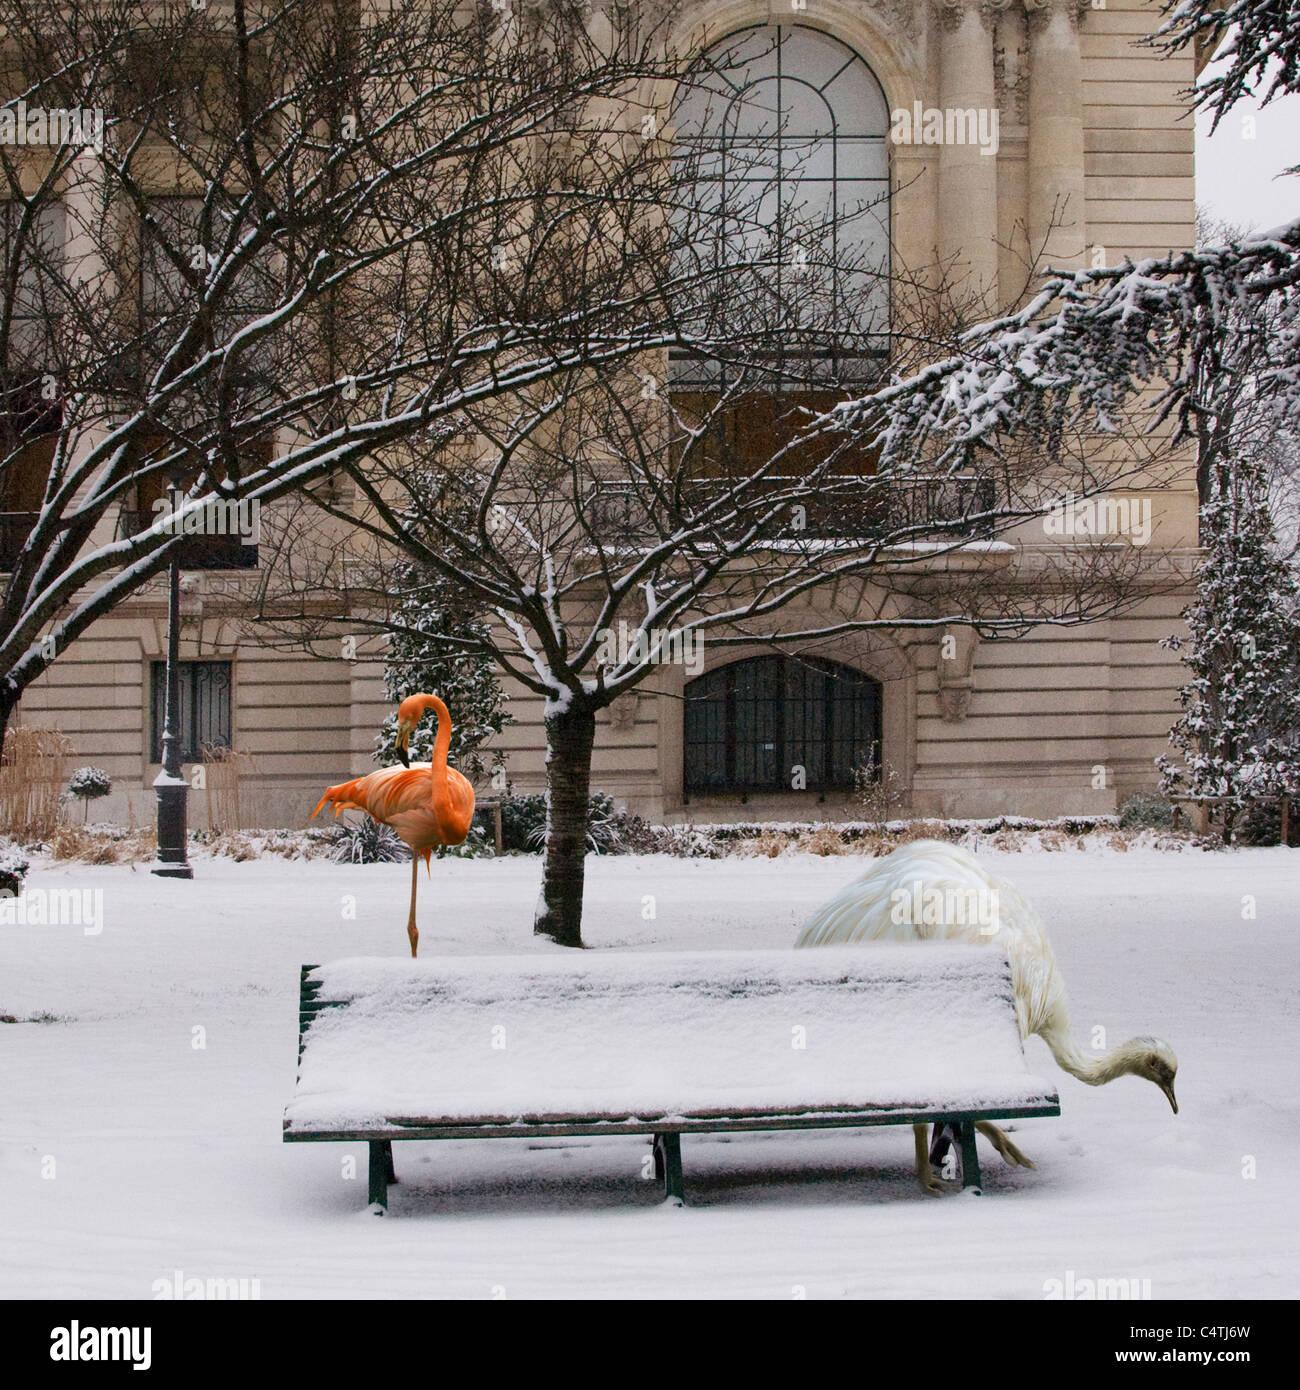 American flamingo et nandou standing in snowy scène urbaine Photo Stock